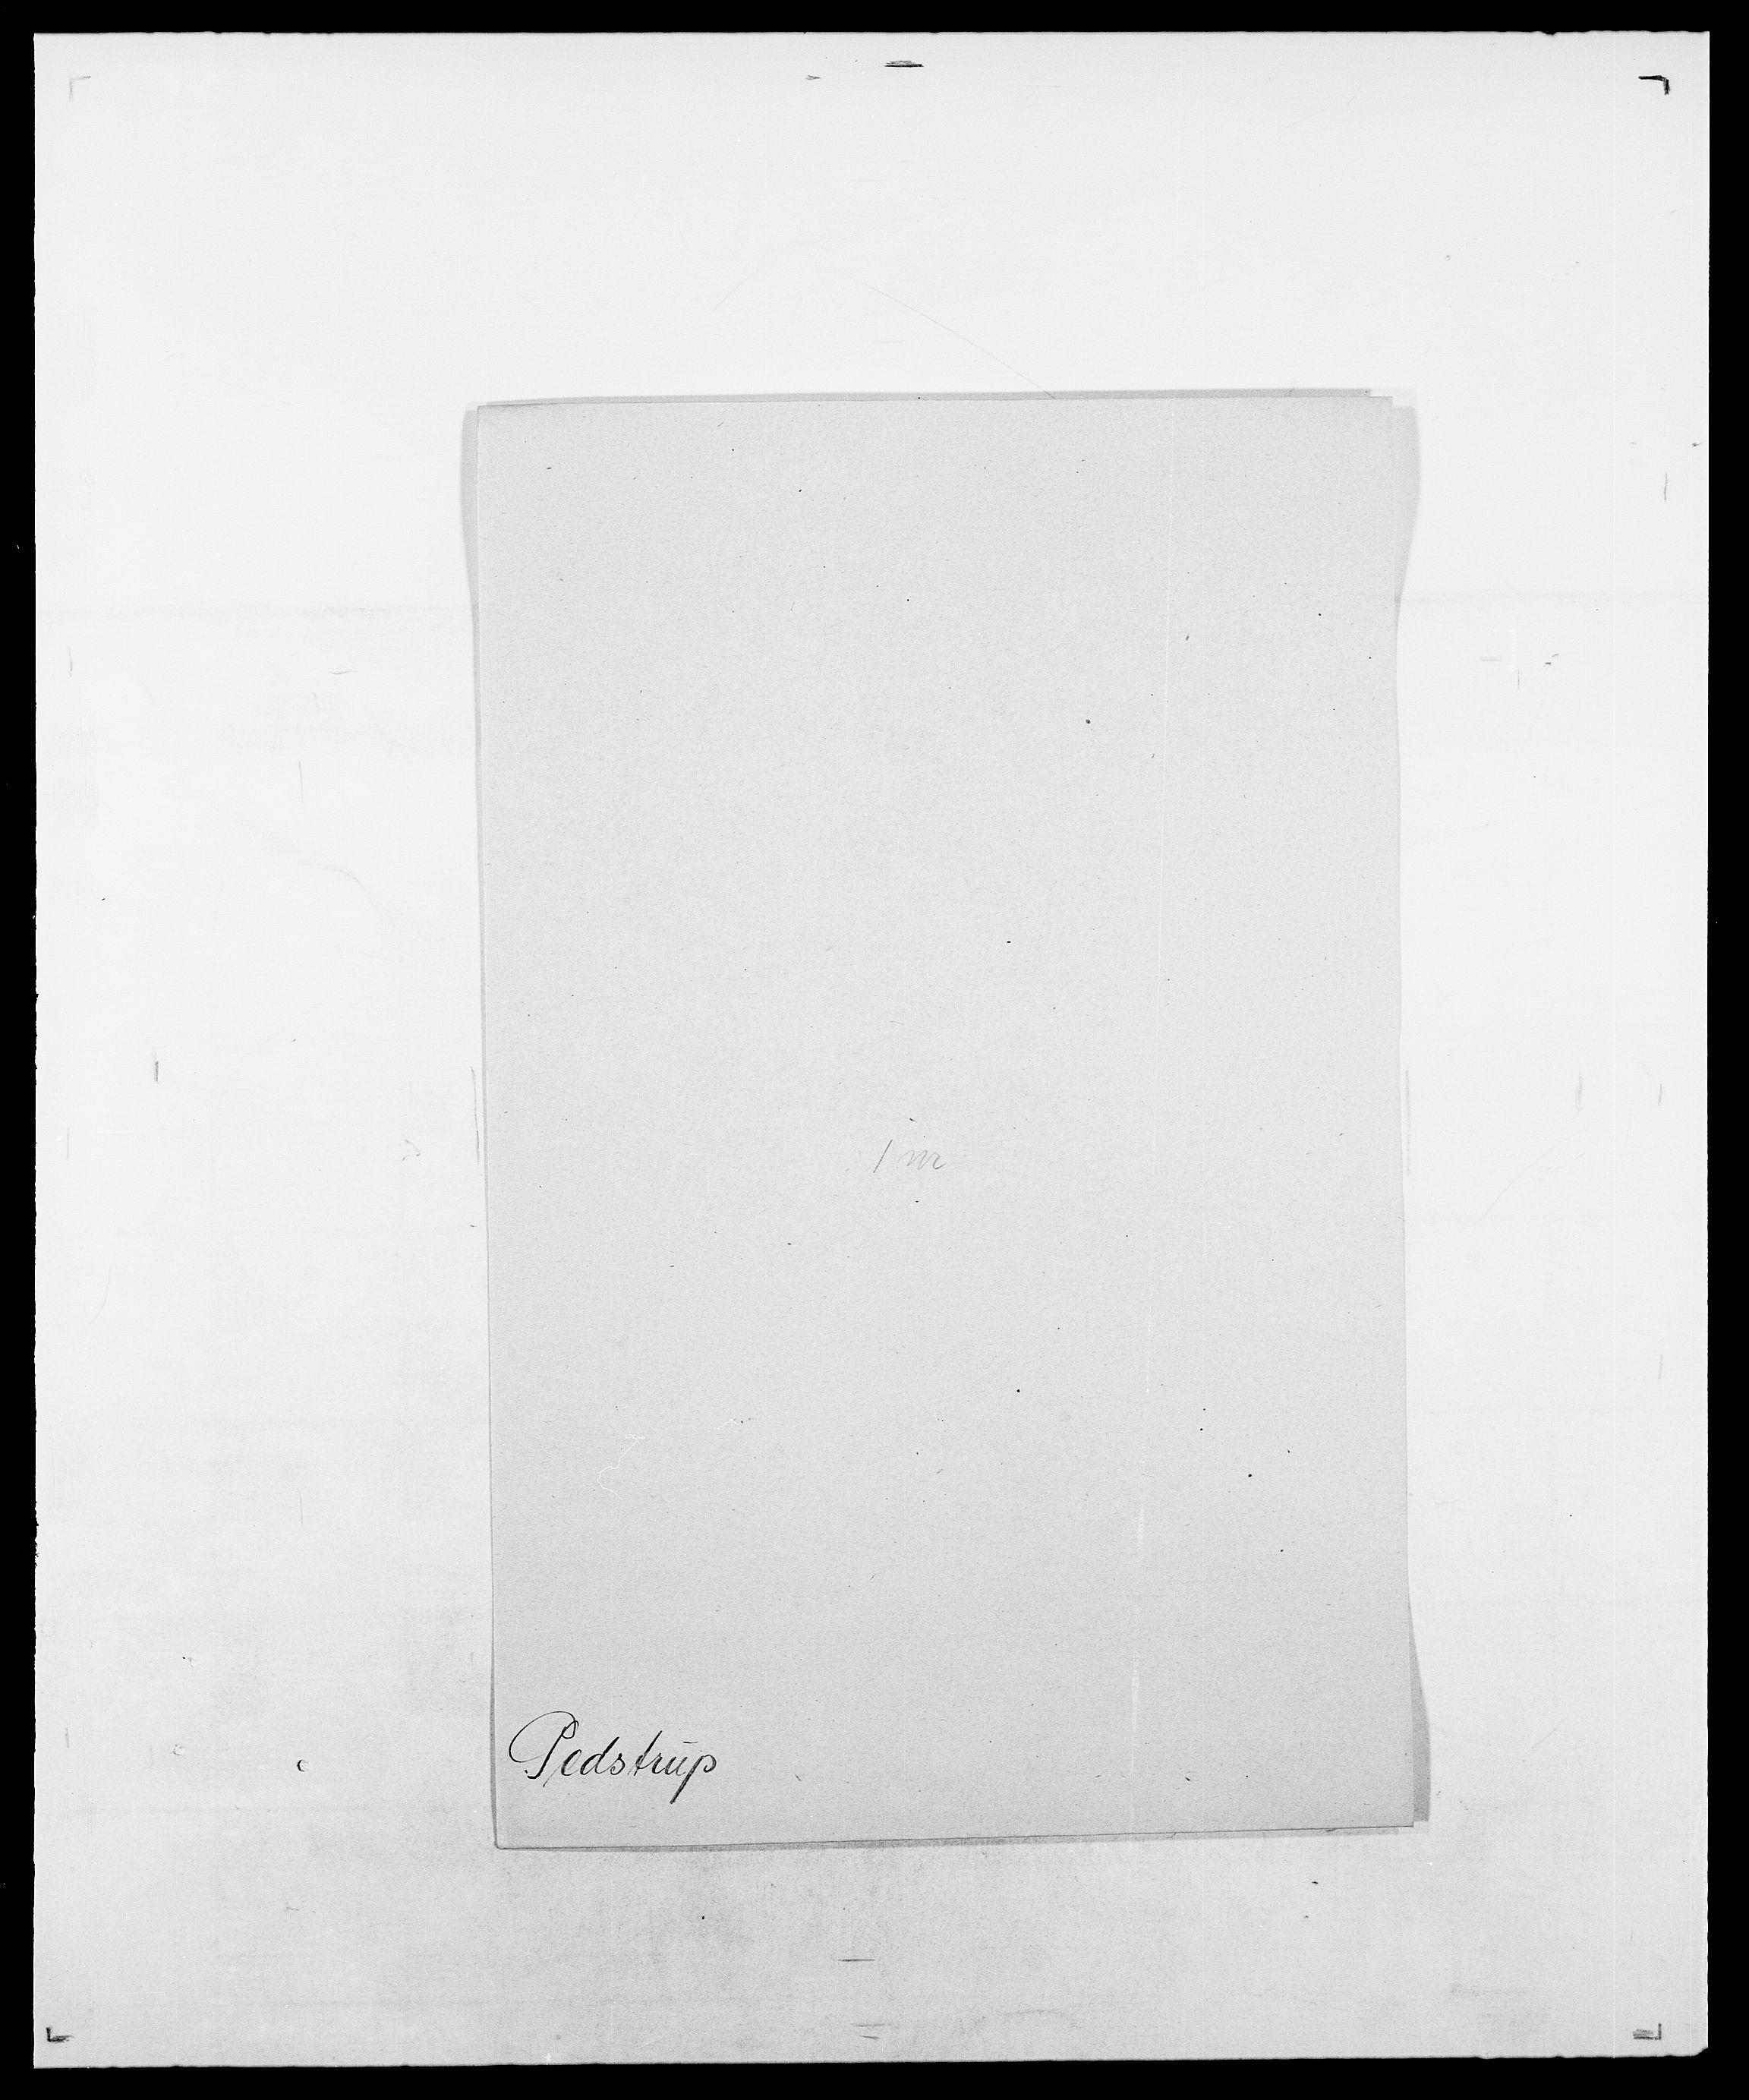 SAO, Delgobe, Charles Antoine - samling, D/Da/L0030: Paars - Pittelkov, s. 310